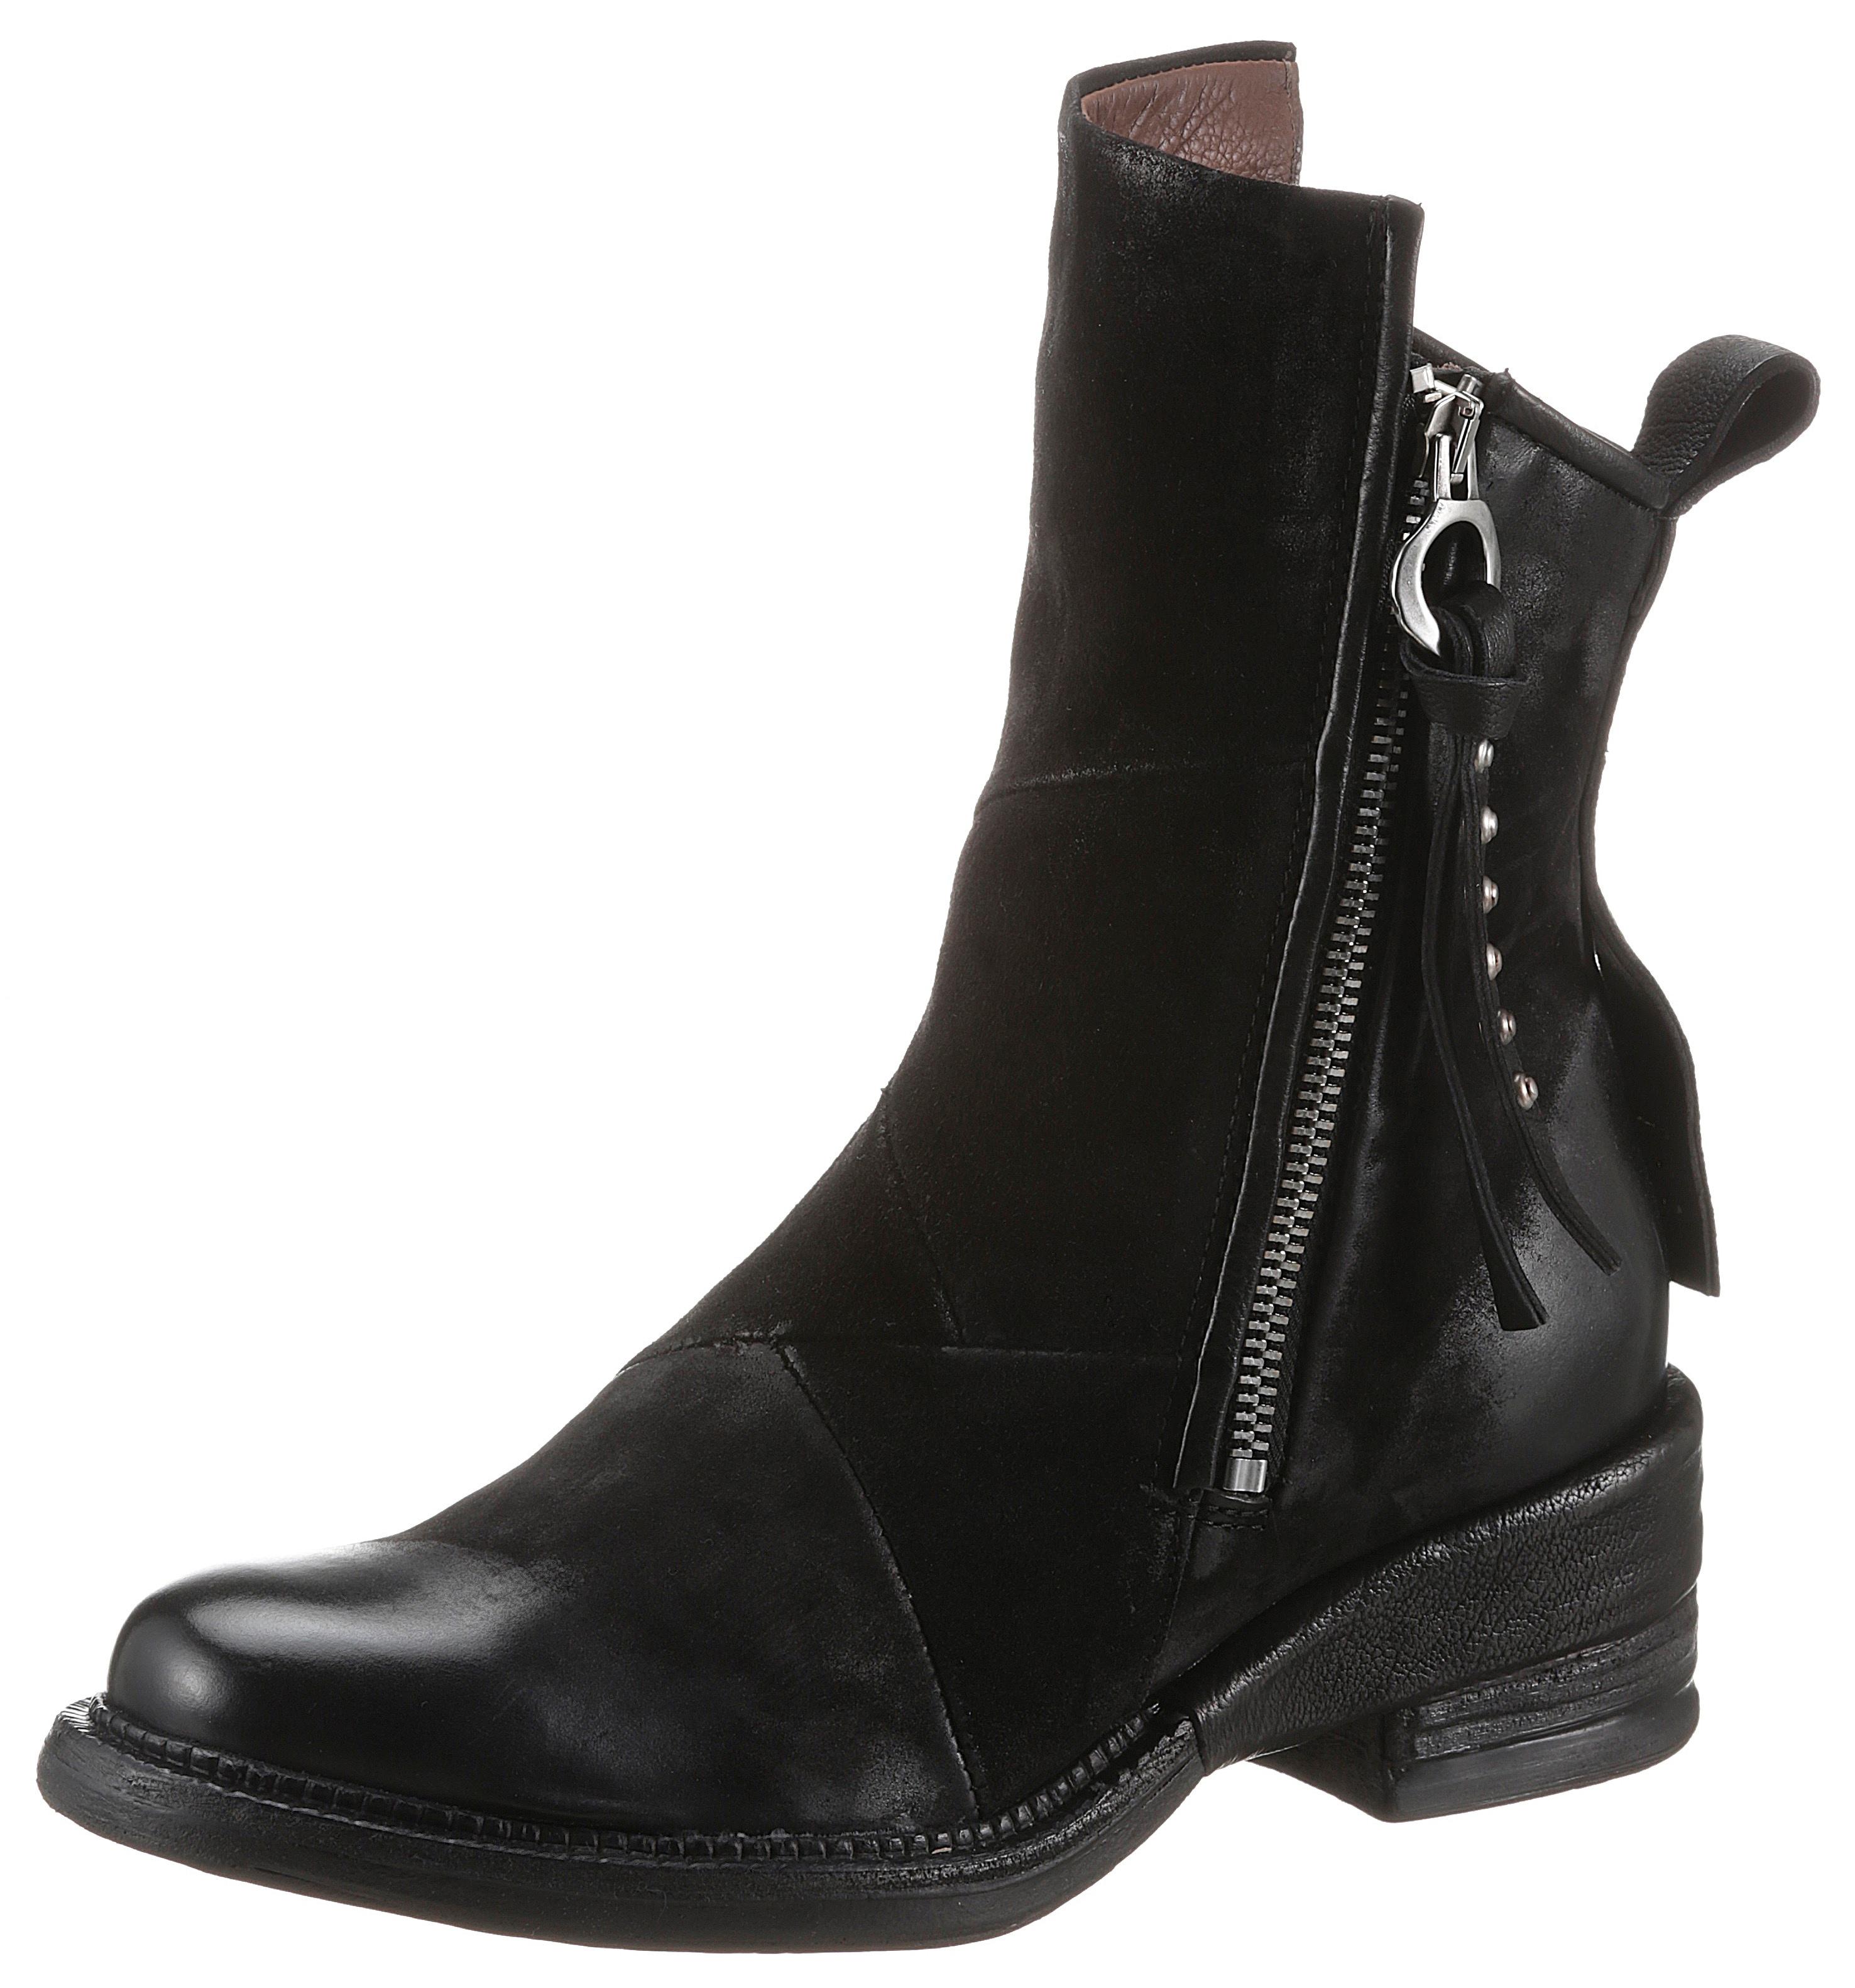 a.s.98 -  Cowboy Boots MIRACLE, mit lässigen Fransen